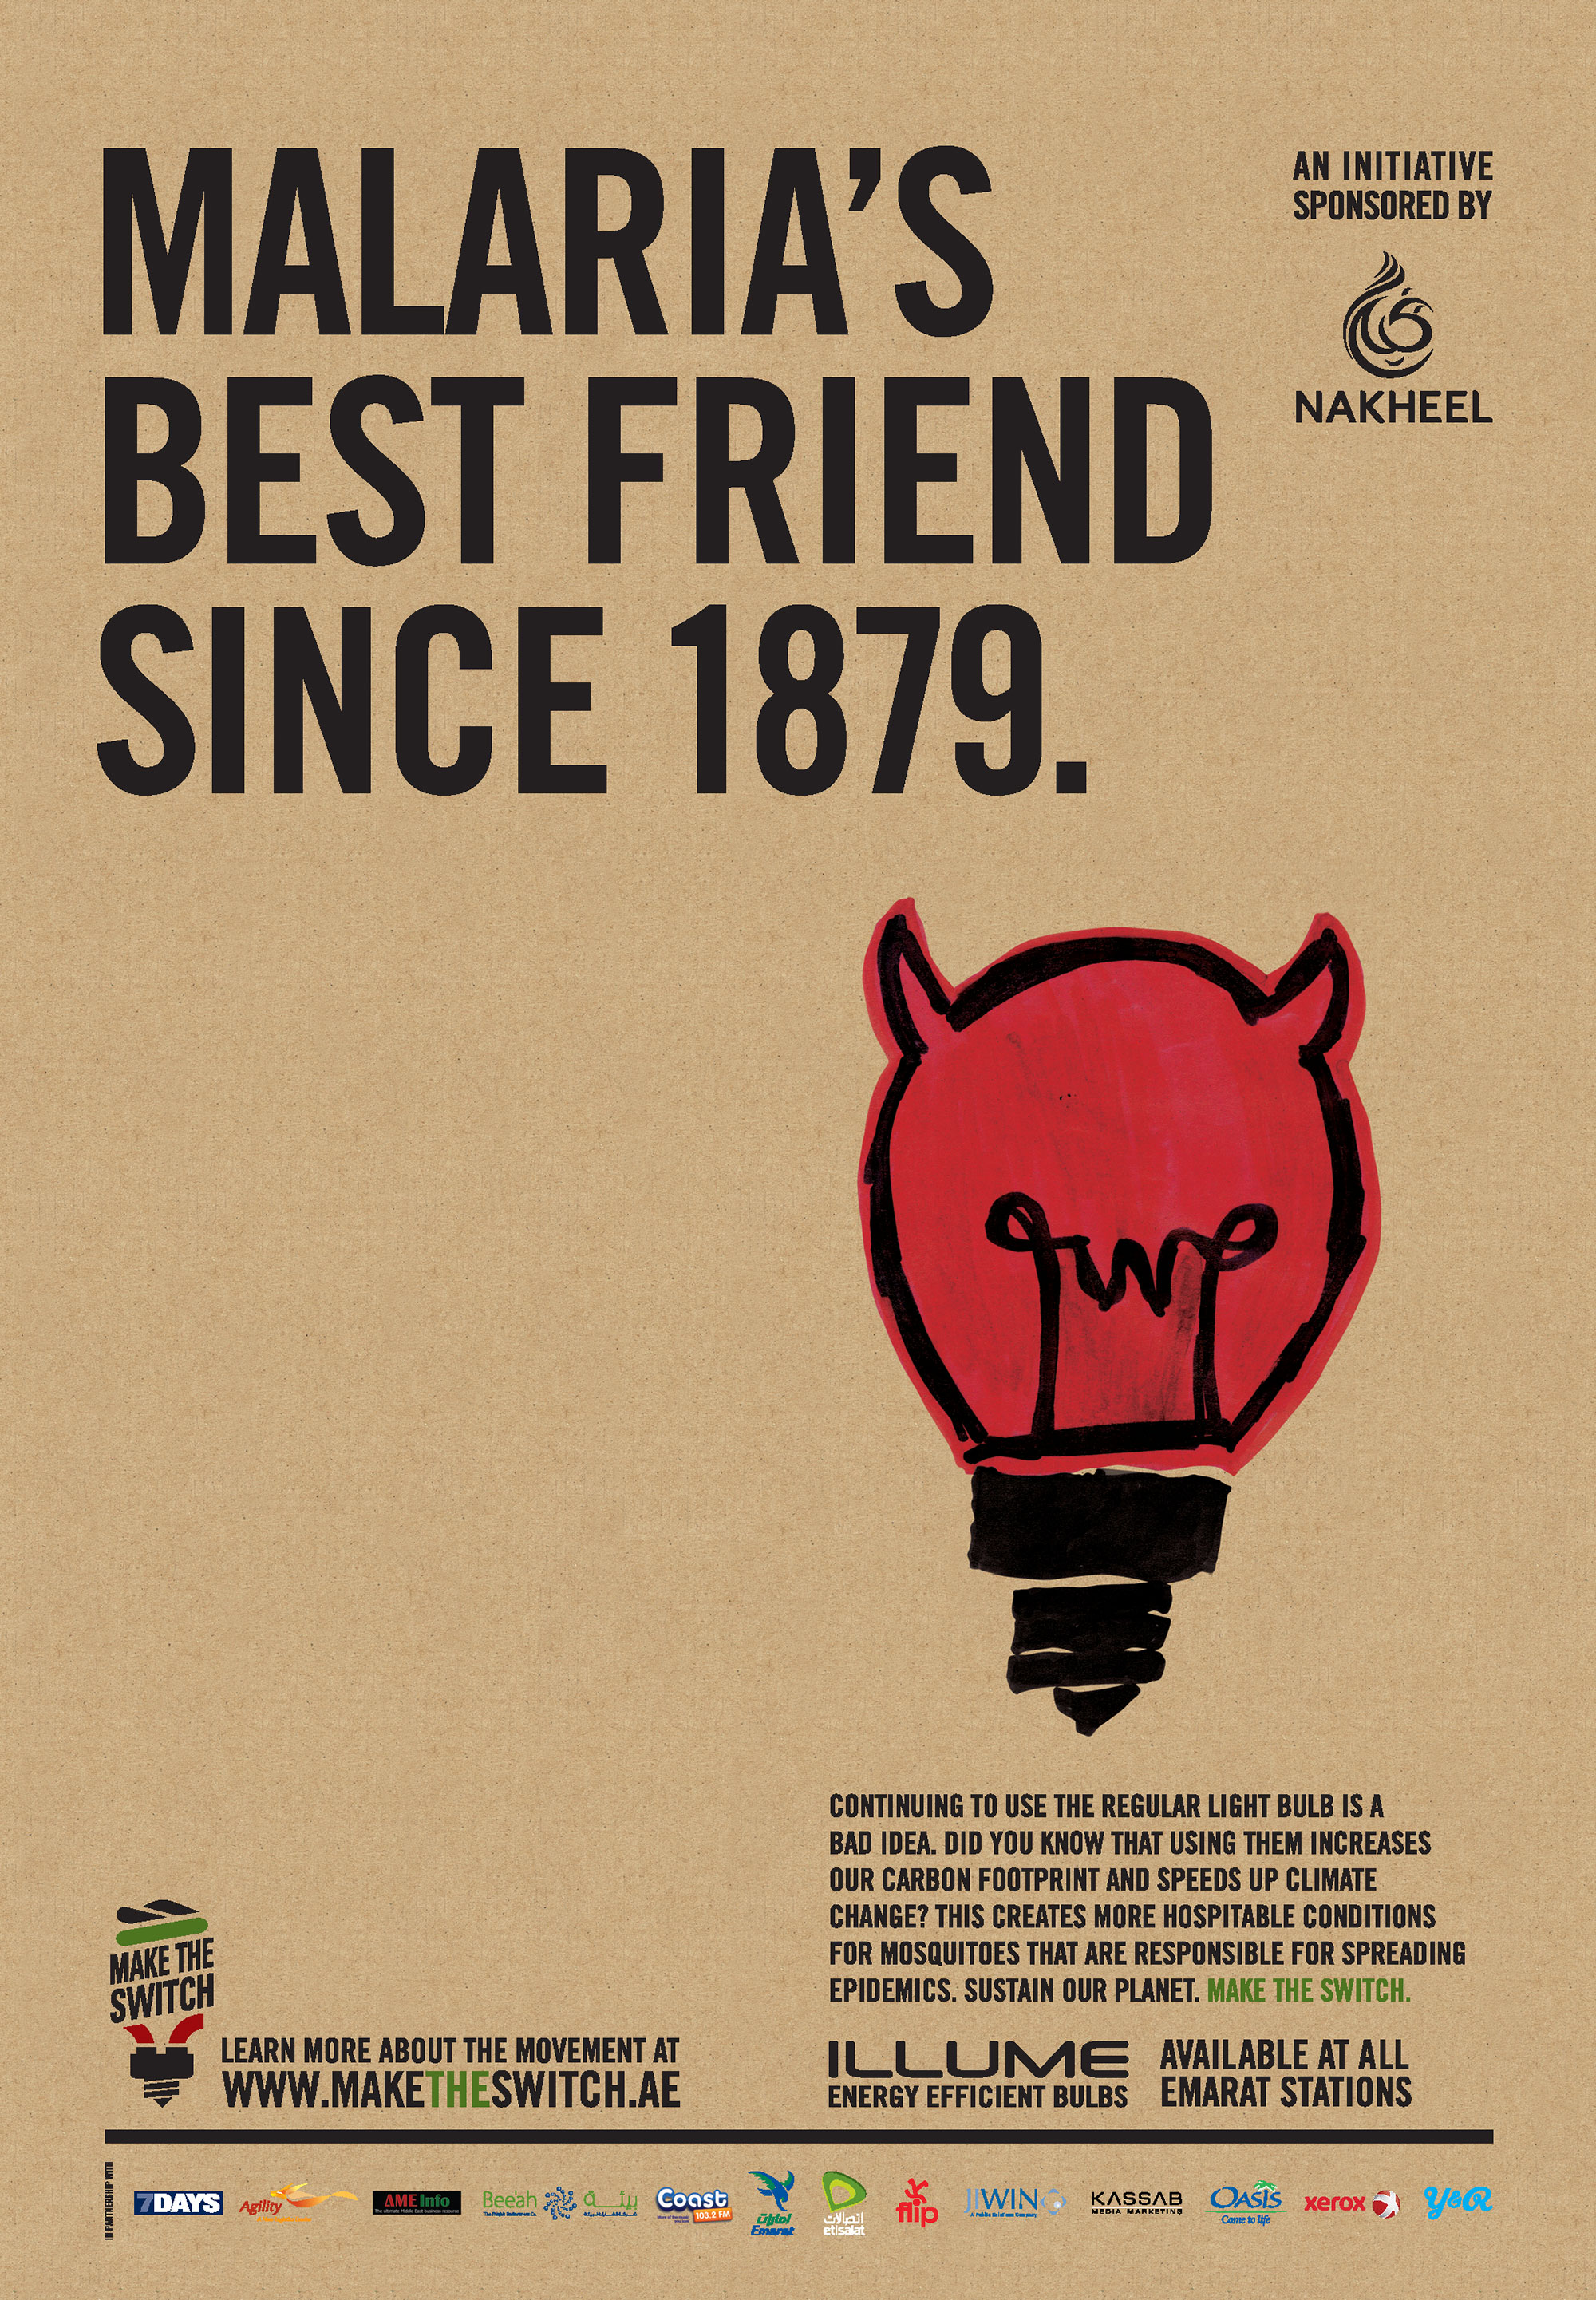 Malaria's best friend since 1879.